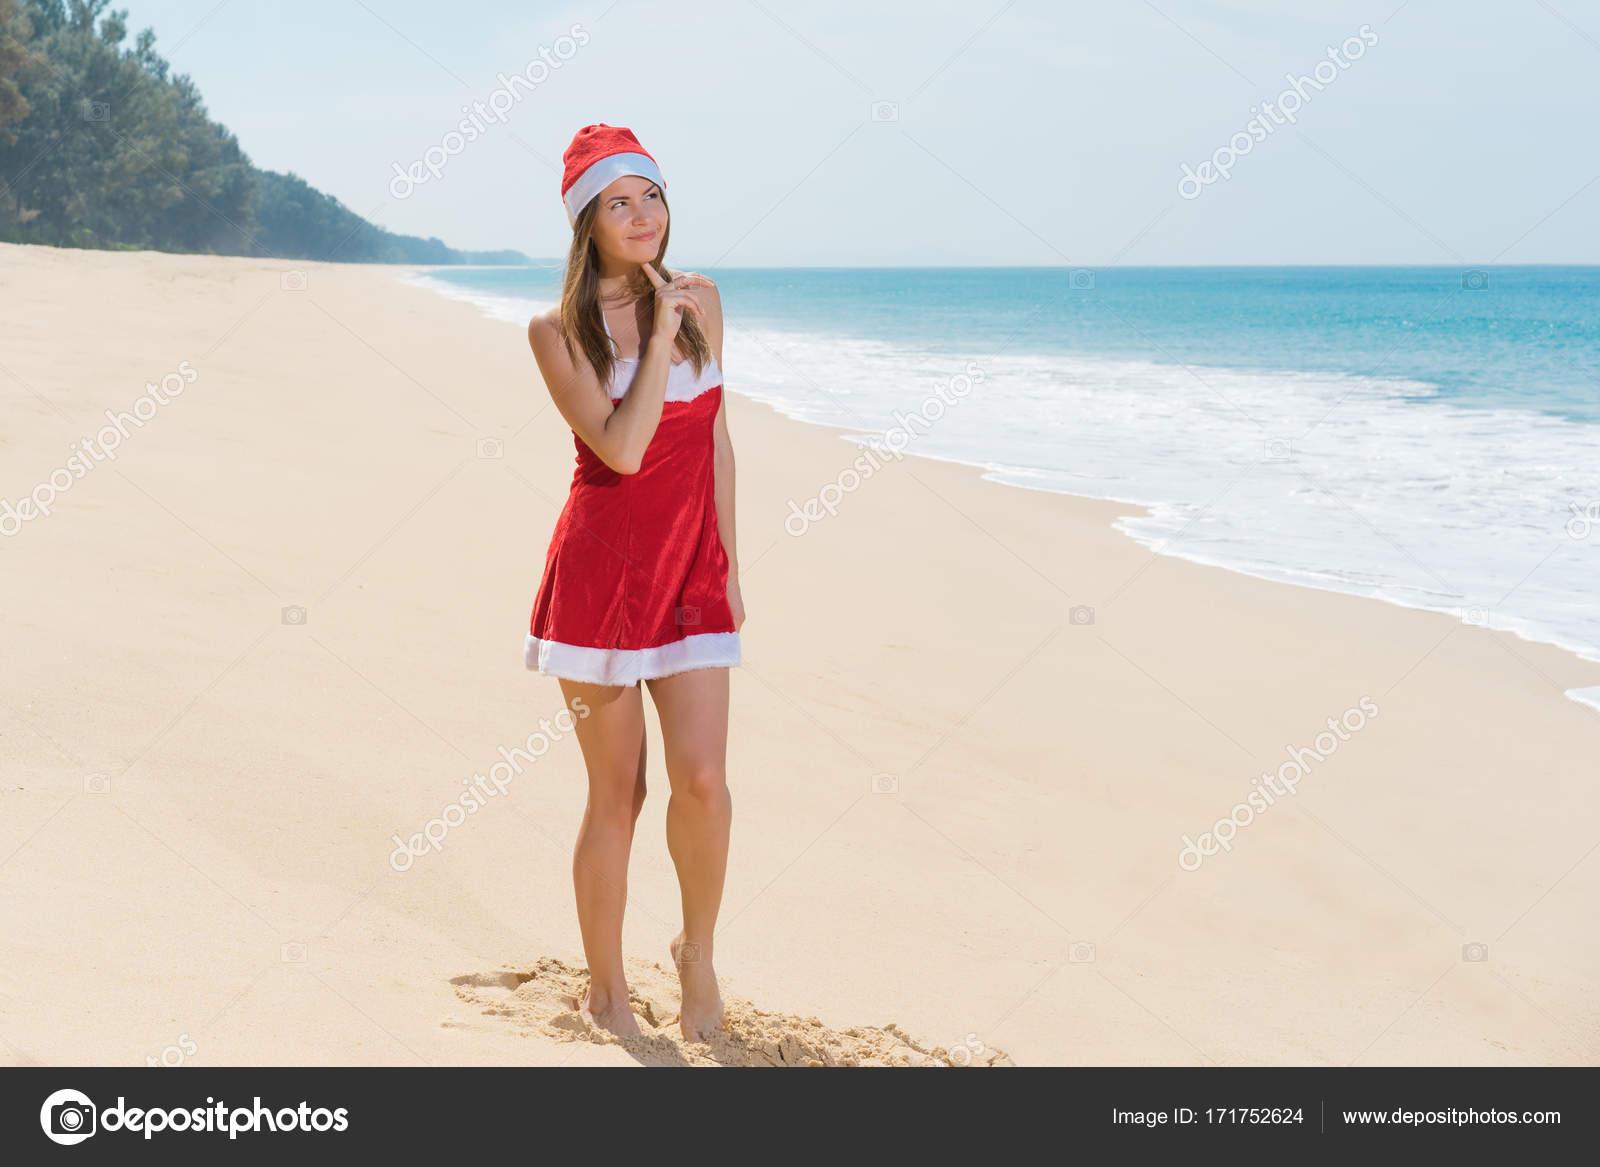 47da23bac335 Γυναίκα στα κόκκινα ρούχα για Χριστούγεννα στη θάλασσα παραλία όνειρα– εικόνα  αρχείου